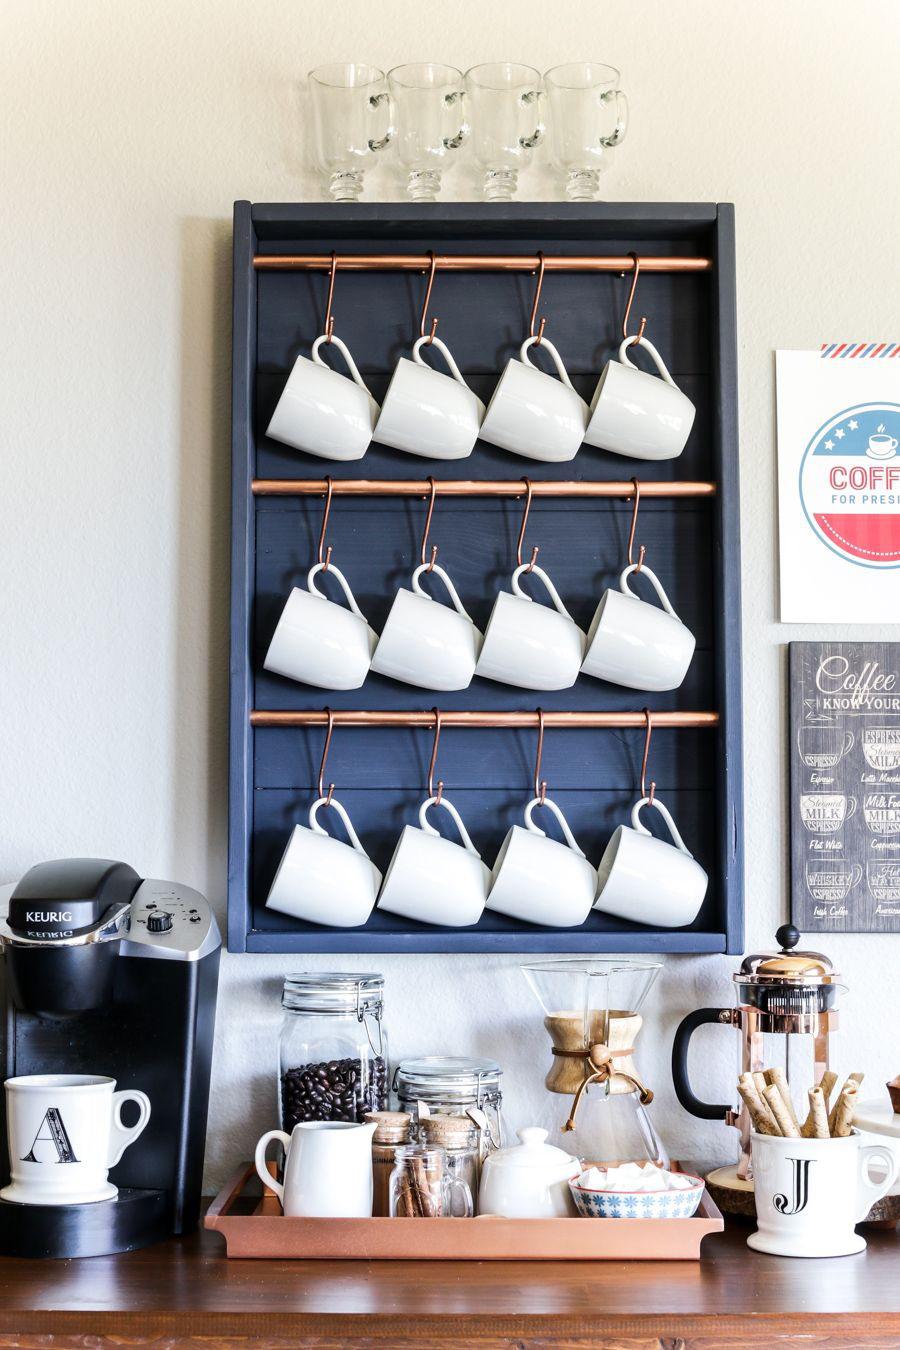 14. SPACE SAVING COFFEE BAR